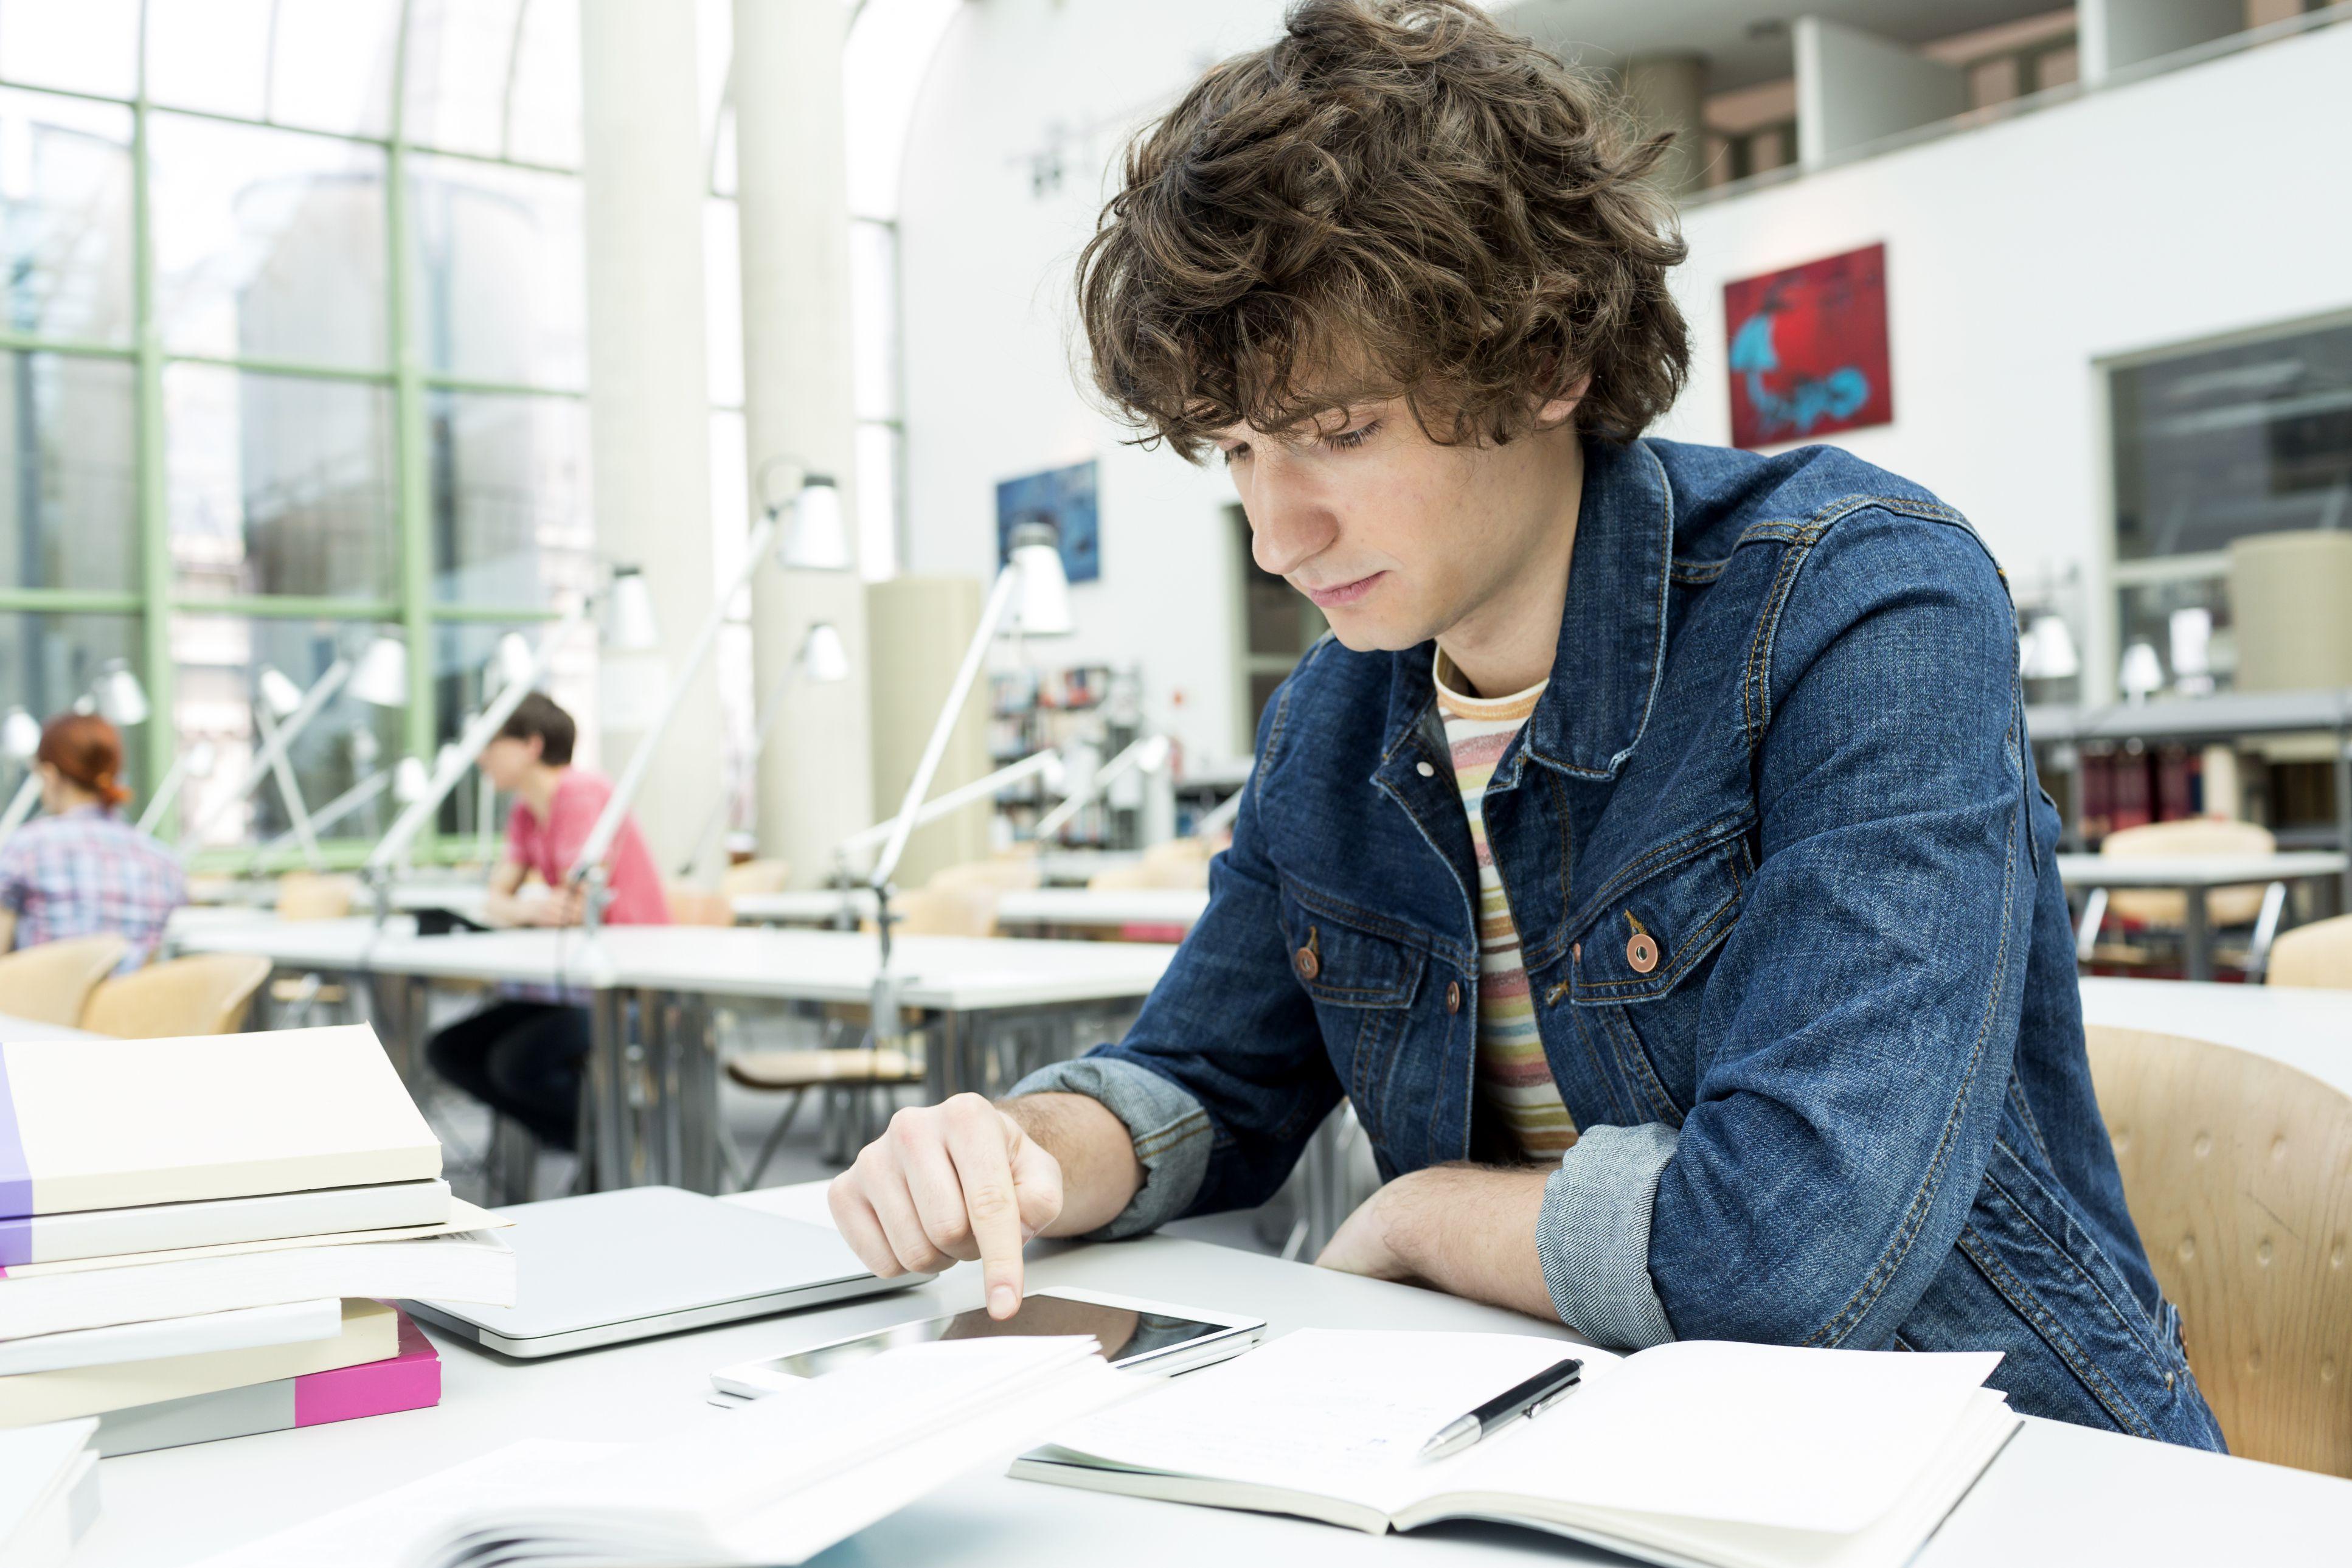 Perceptive student